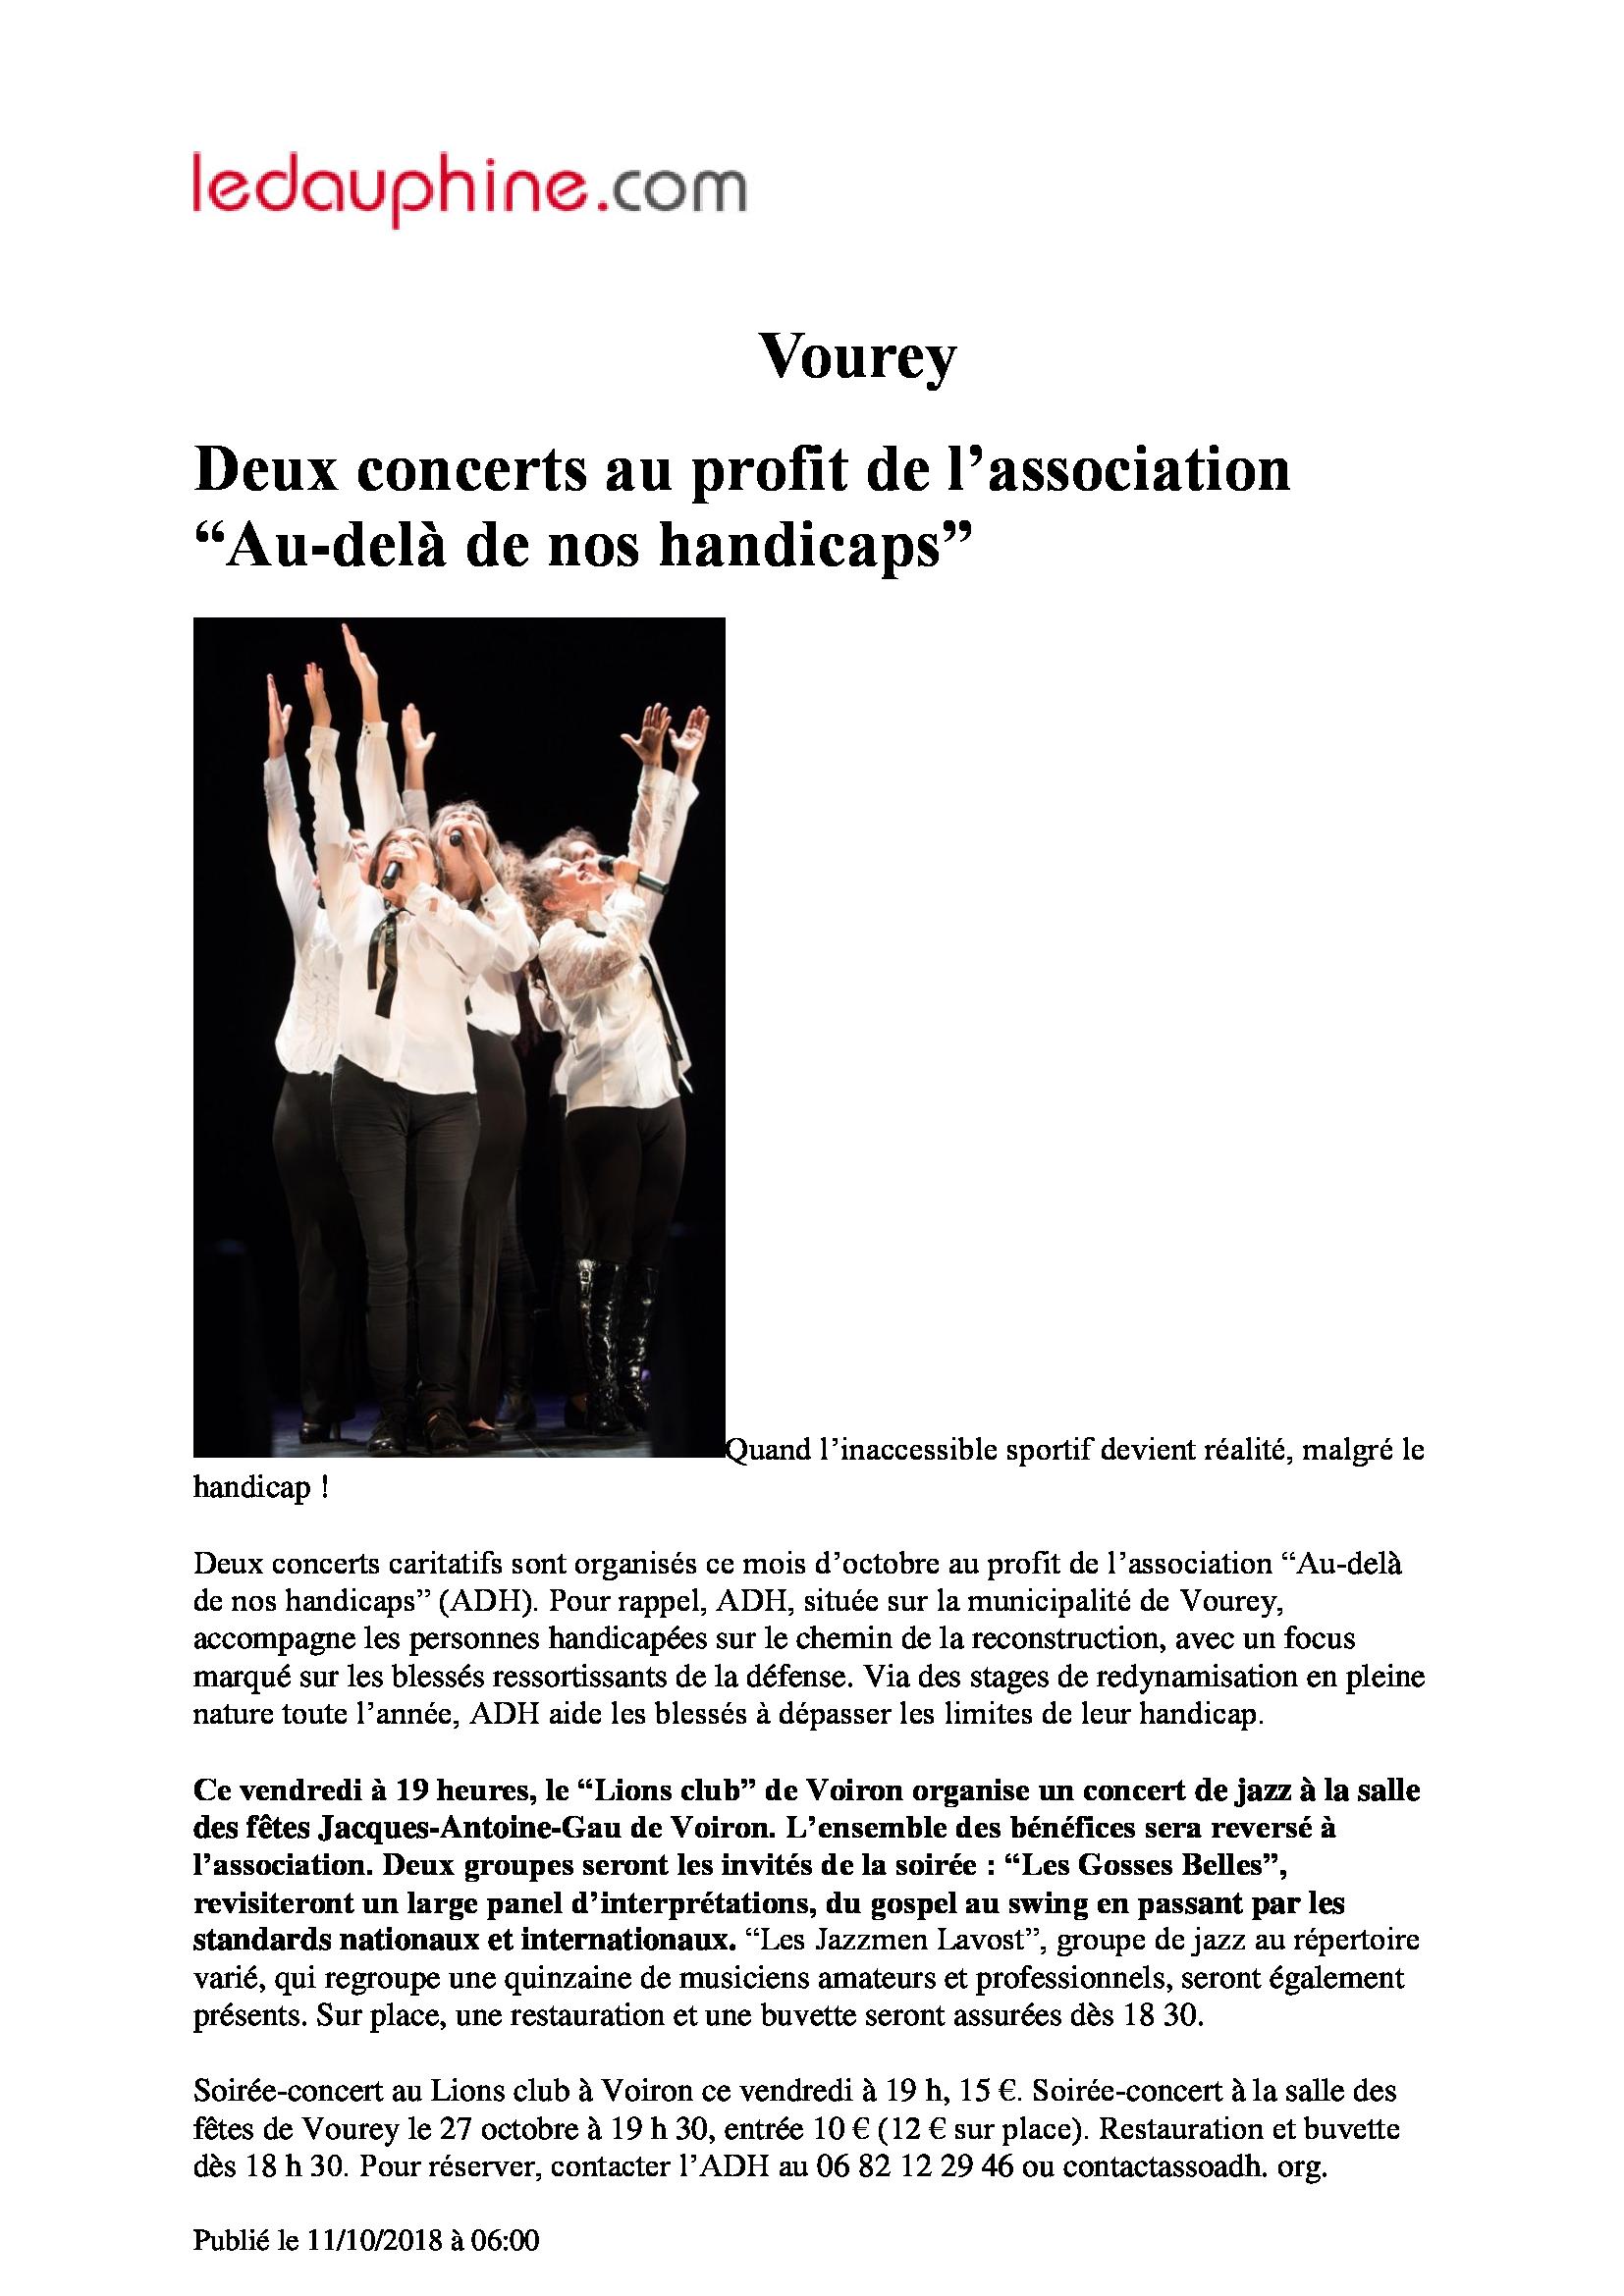 DL-Vourey-VOIRON-lions-club